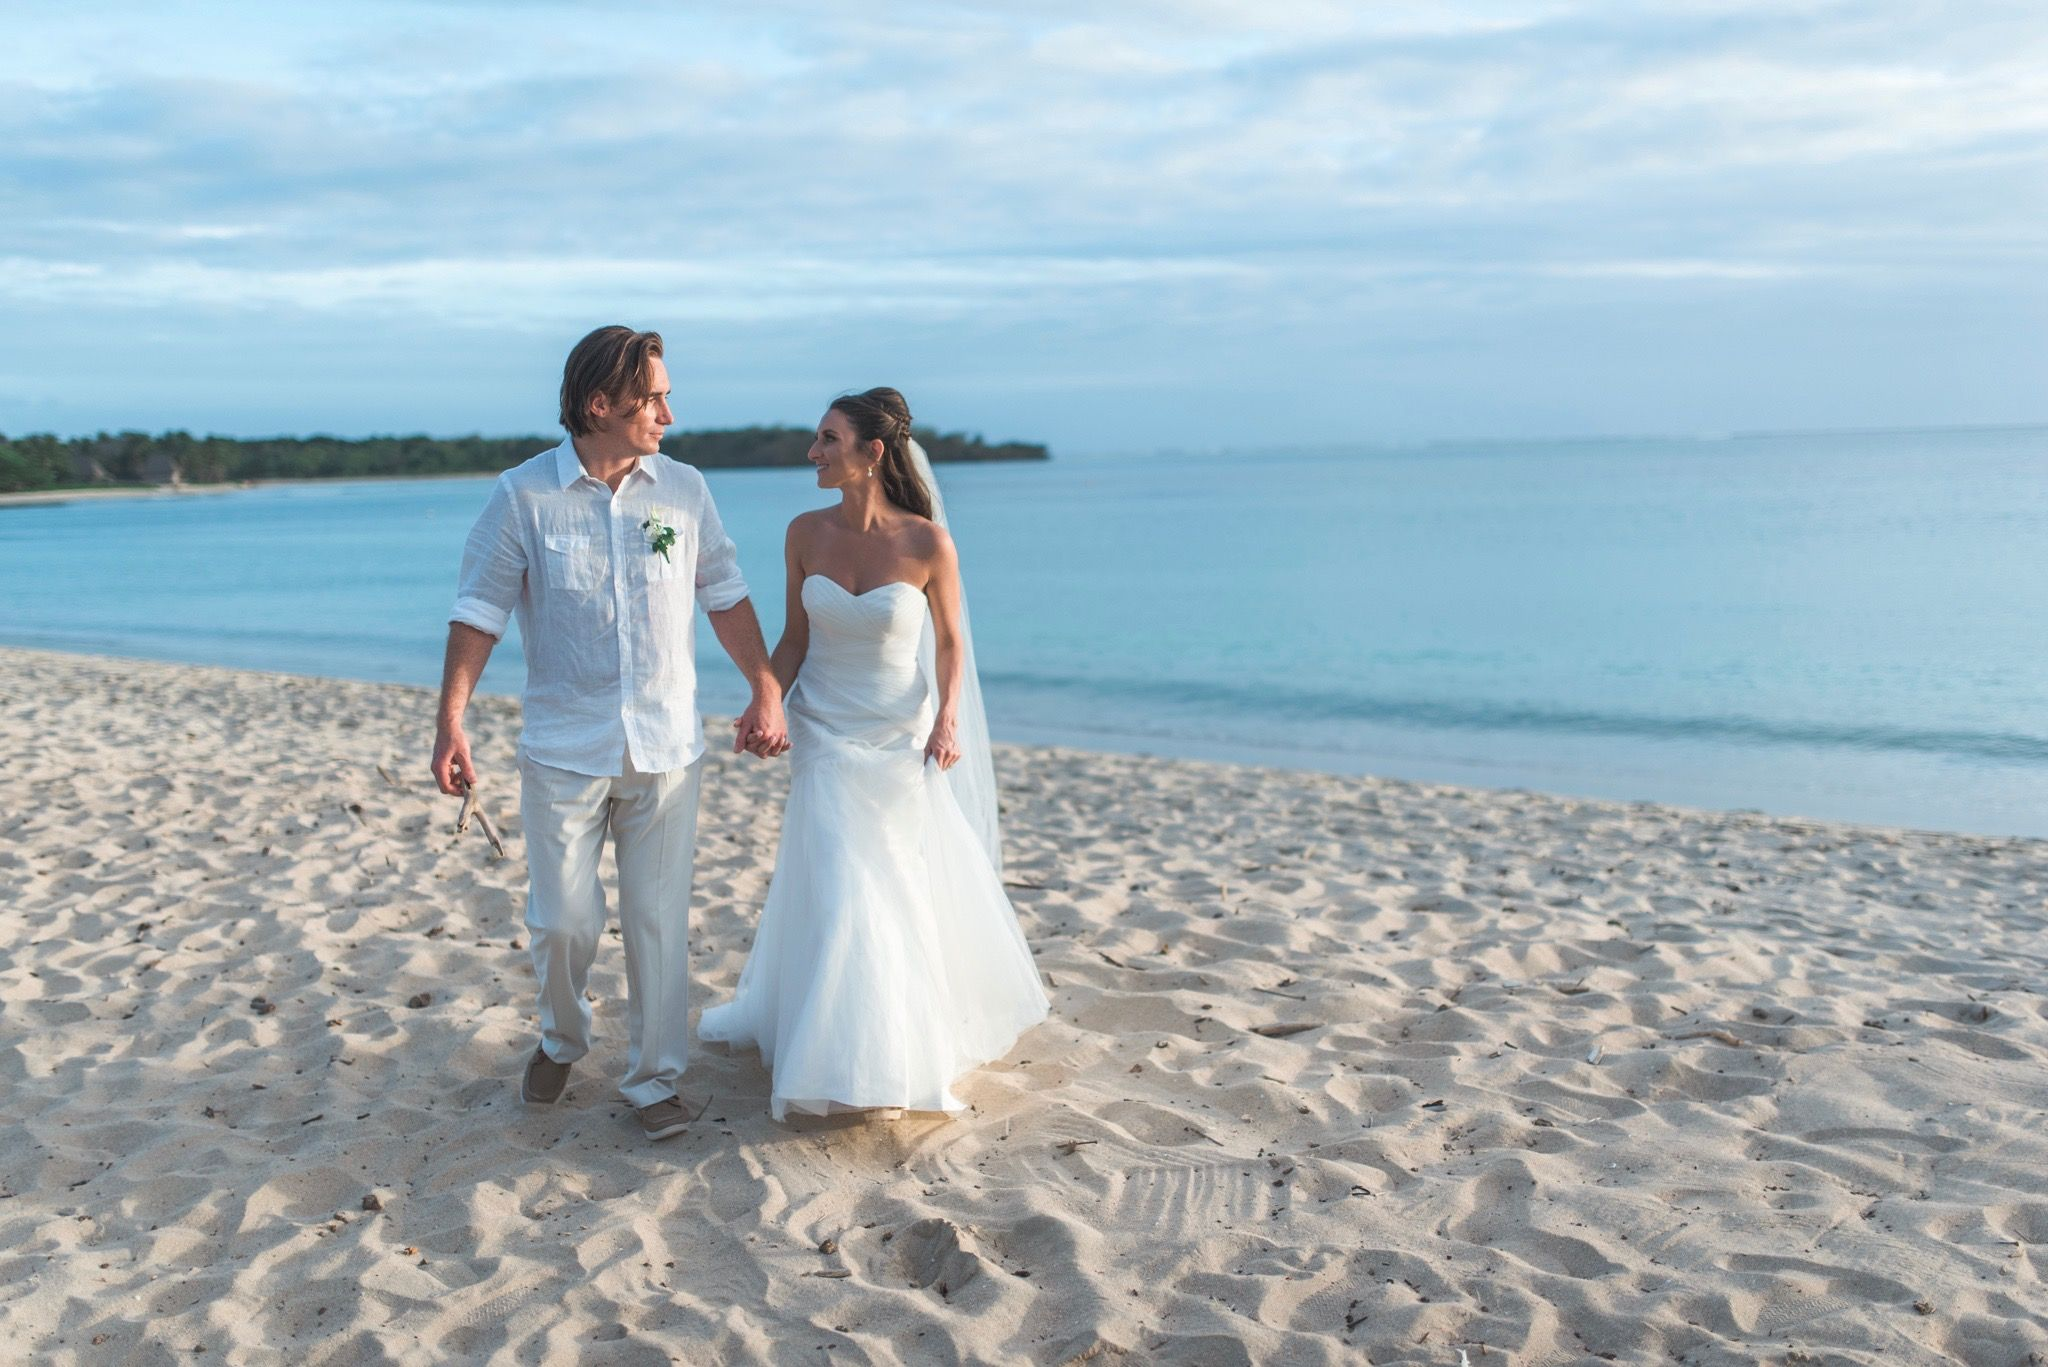 Destination tevutevu tropical beach wedding ceremony took place on